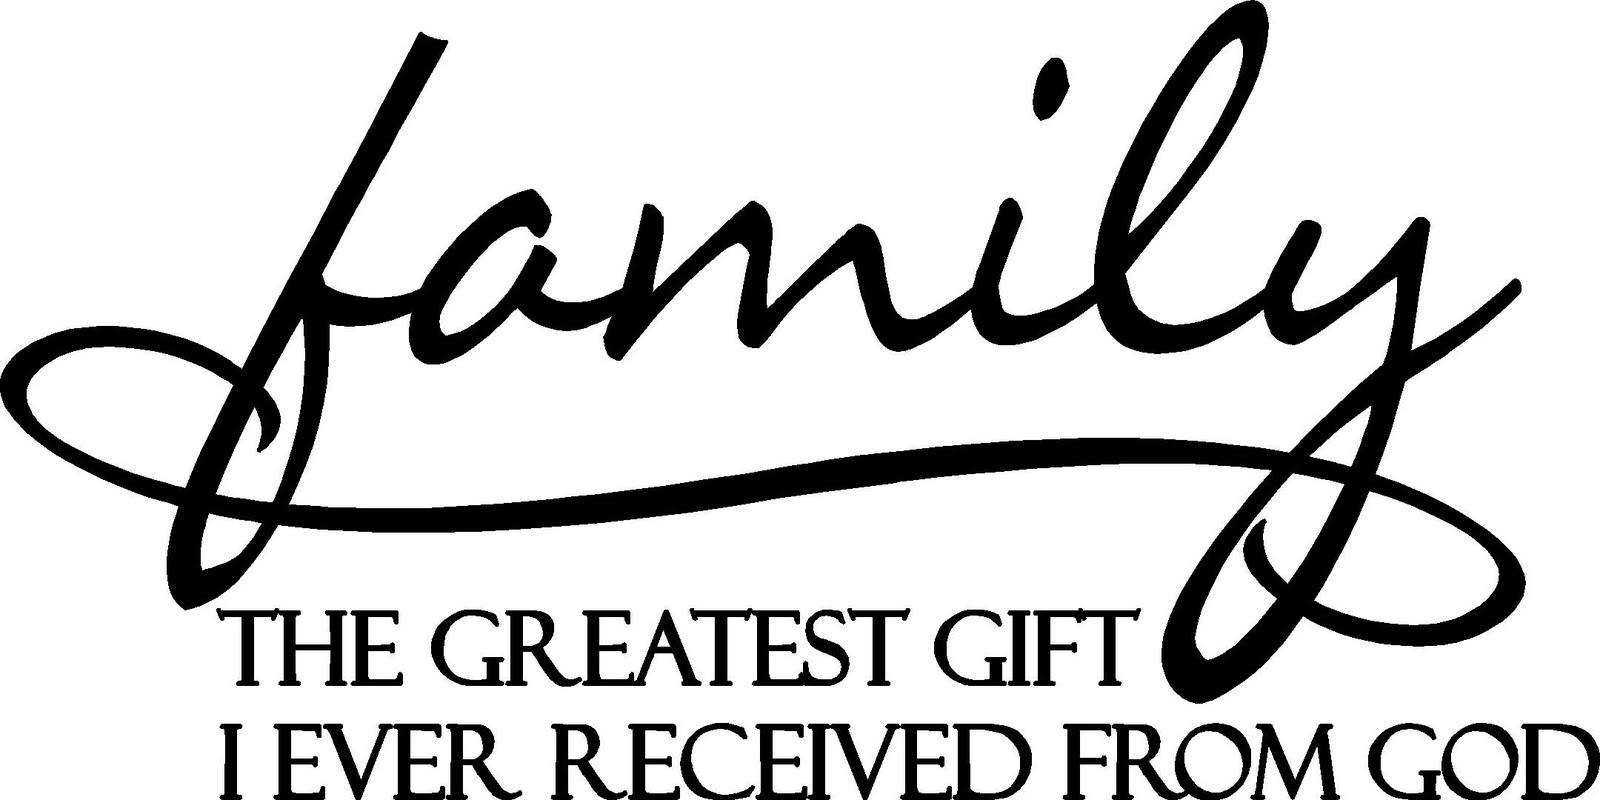 http://2.bp.blogspot.com/_dDOoIijcBSY/TTXhBzNXYtI/AAAAAAAAAC8/SQNcI8FIlKI/s1600/family_-_the_greatest_gift_i_ever_received_from_god.jpg